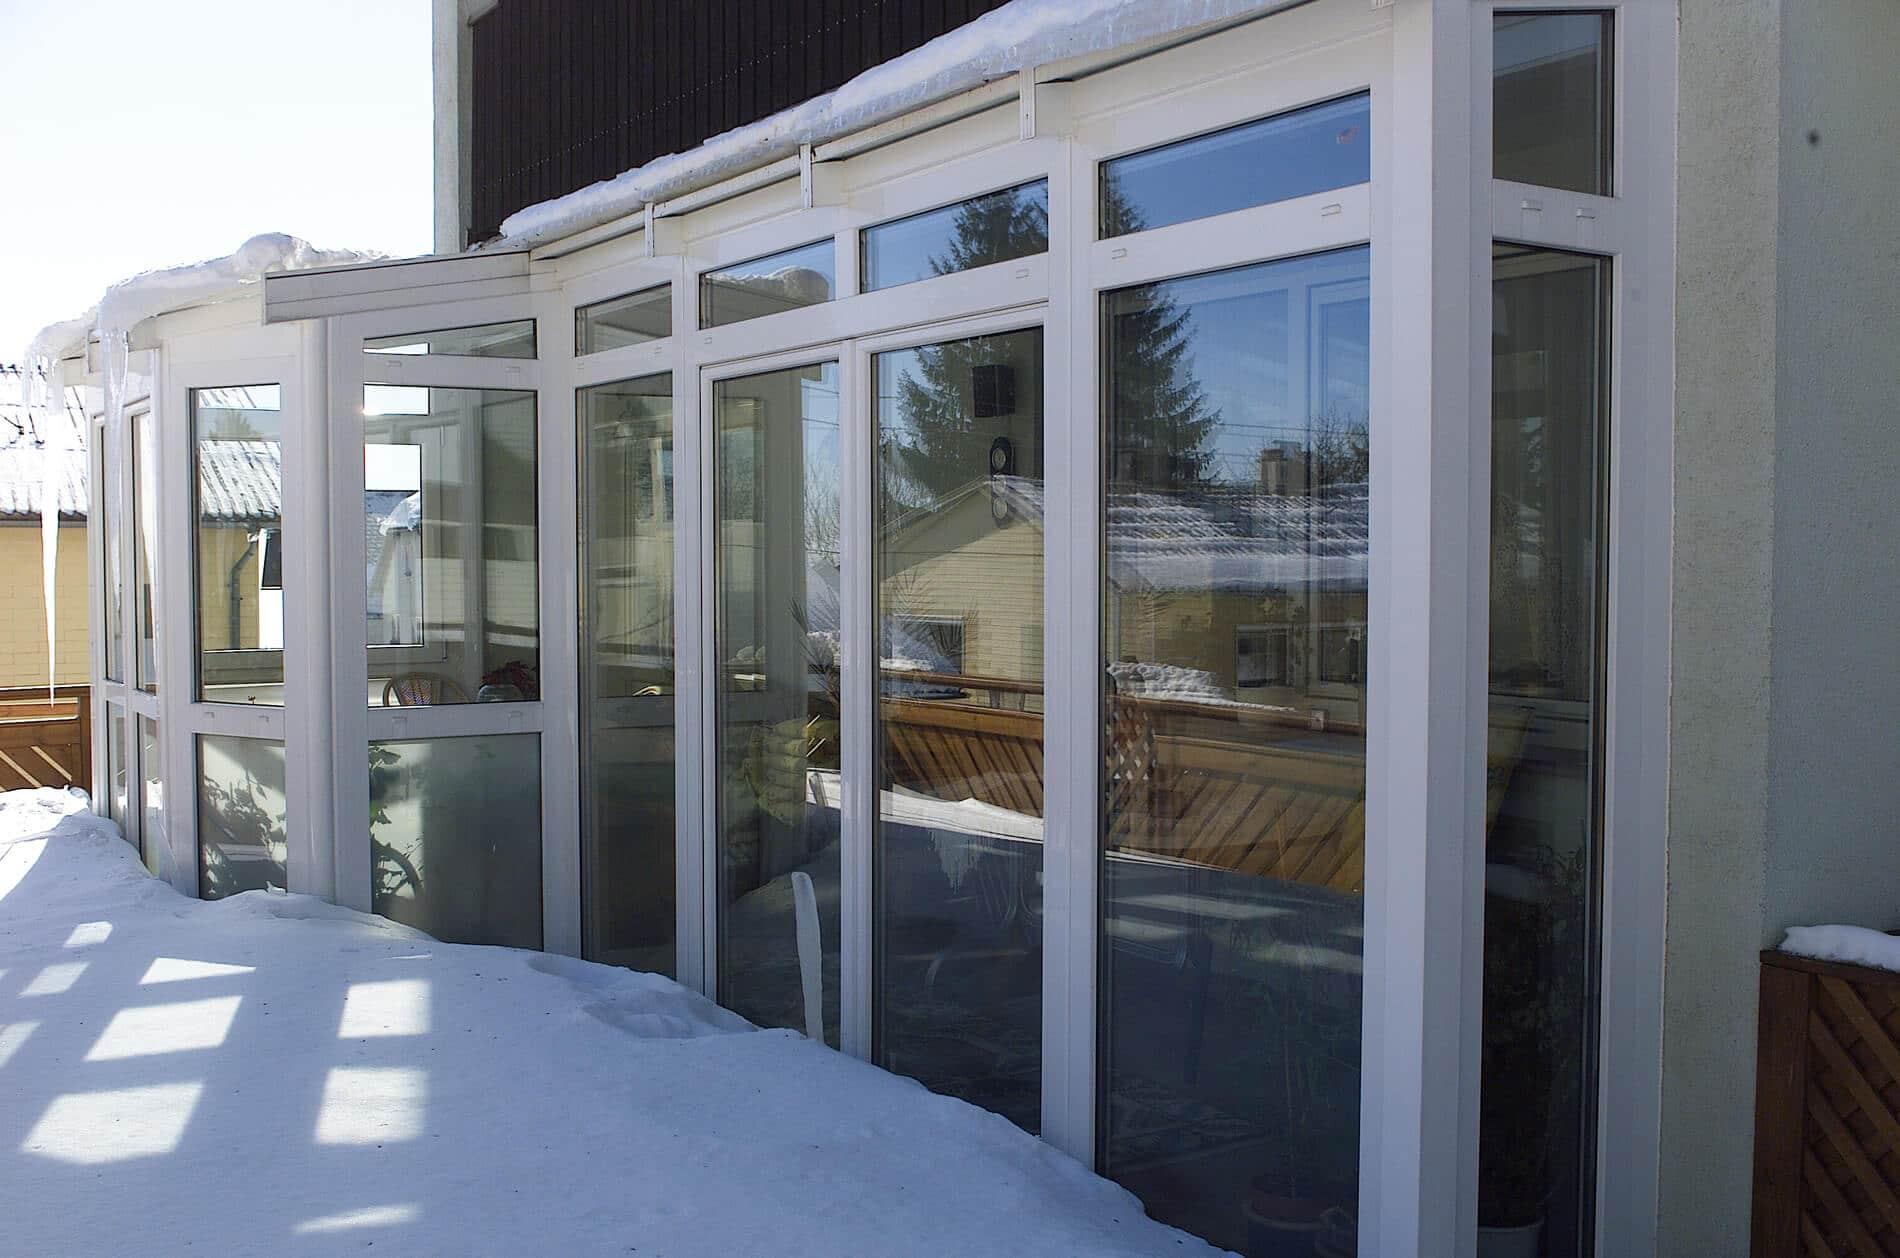 wintergarten kirchschlag bei linz wintergarten schmidinger. Black Bedroom Furniture Sets. Home Design Ideas